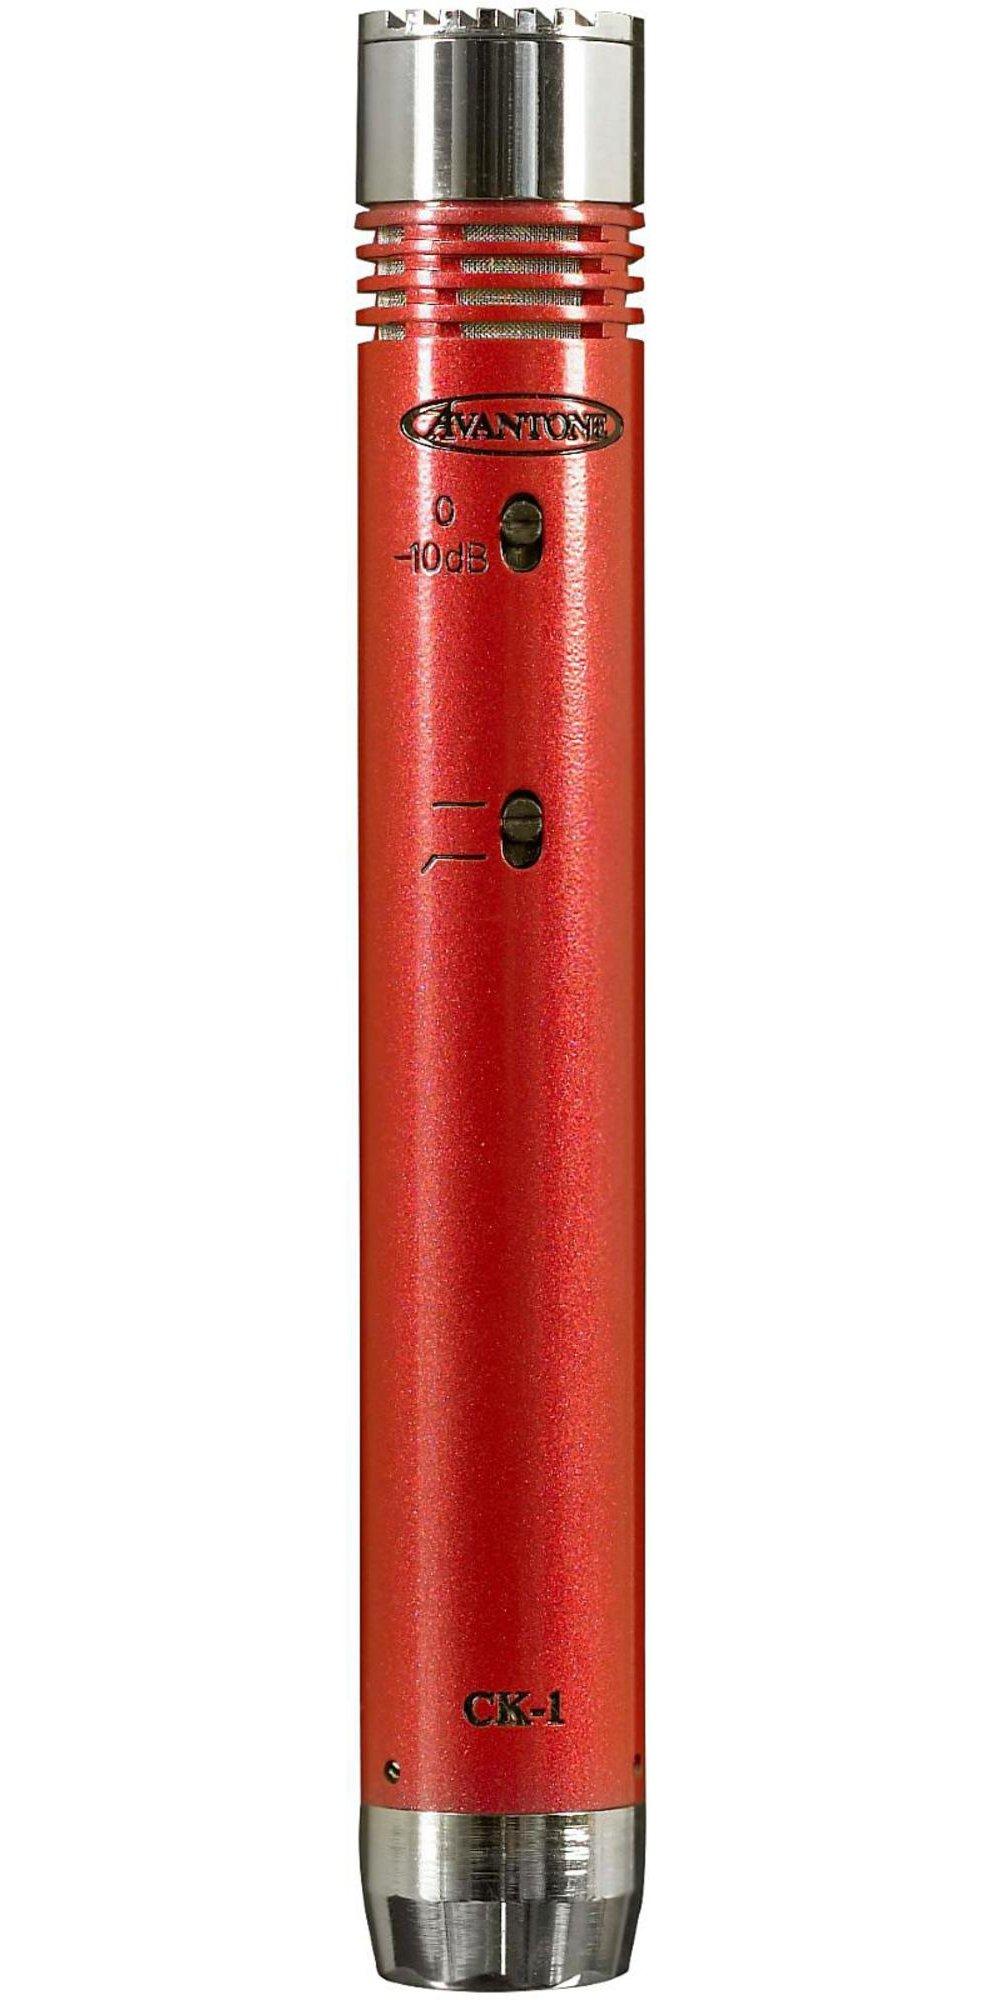 Avantone Pro CK-1 Small-Diaphragm Condenser Microphone